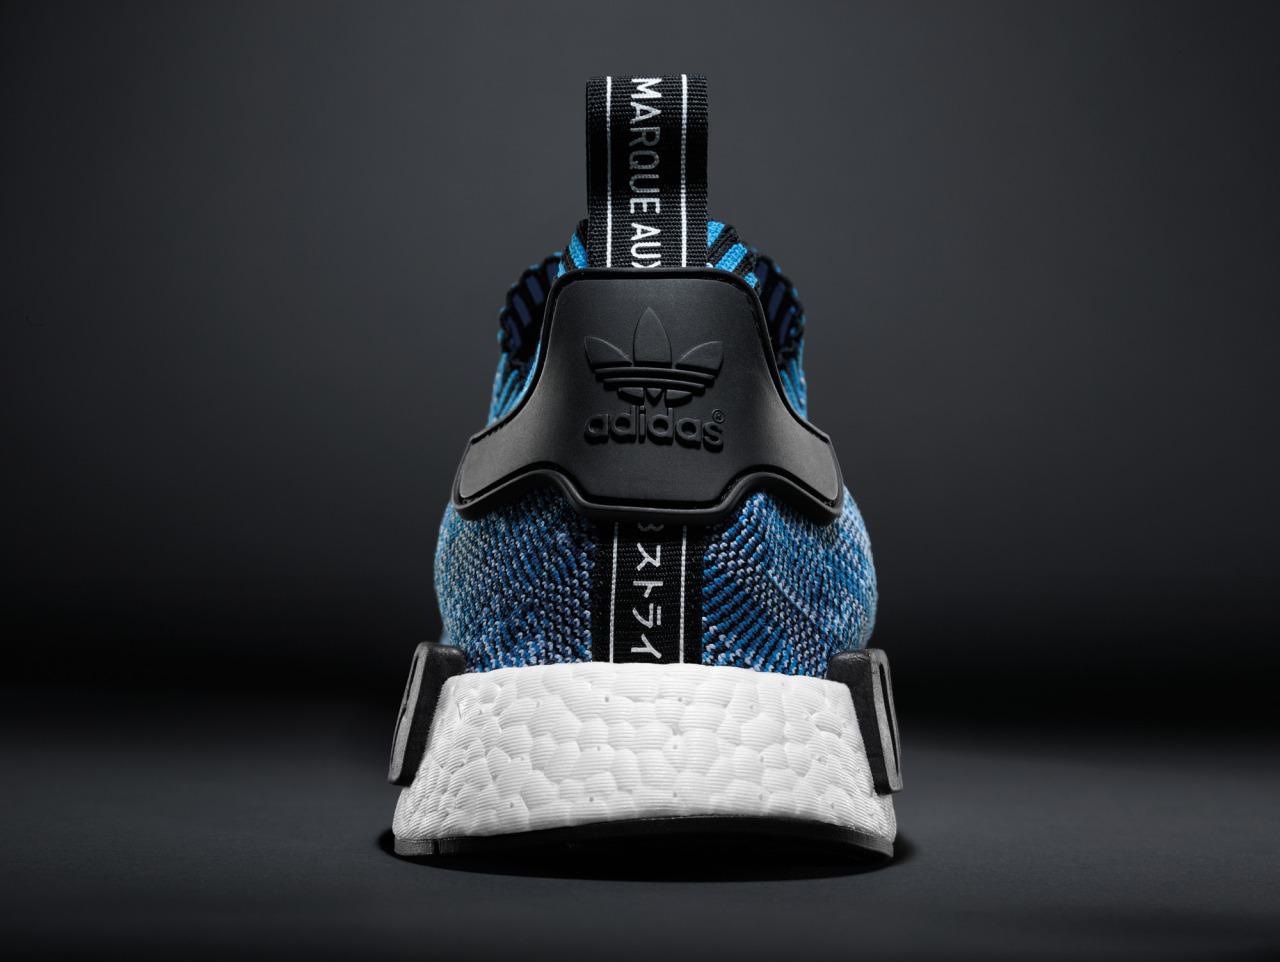 adidas-nmd-r1-primeknit-blue-camo-03